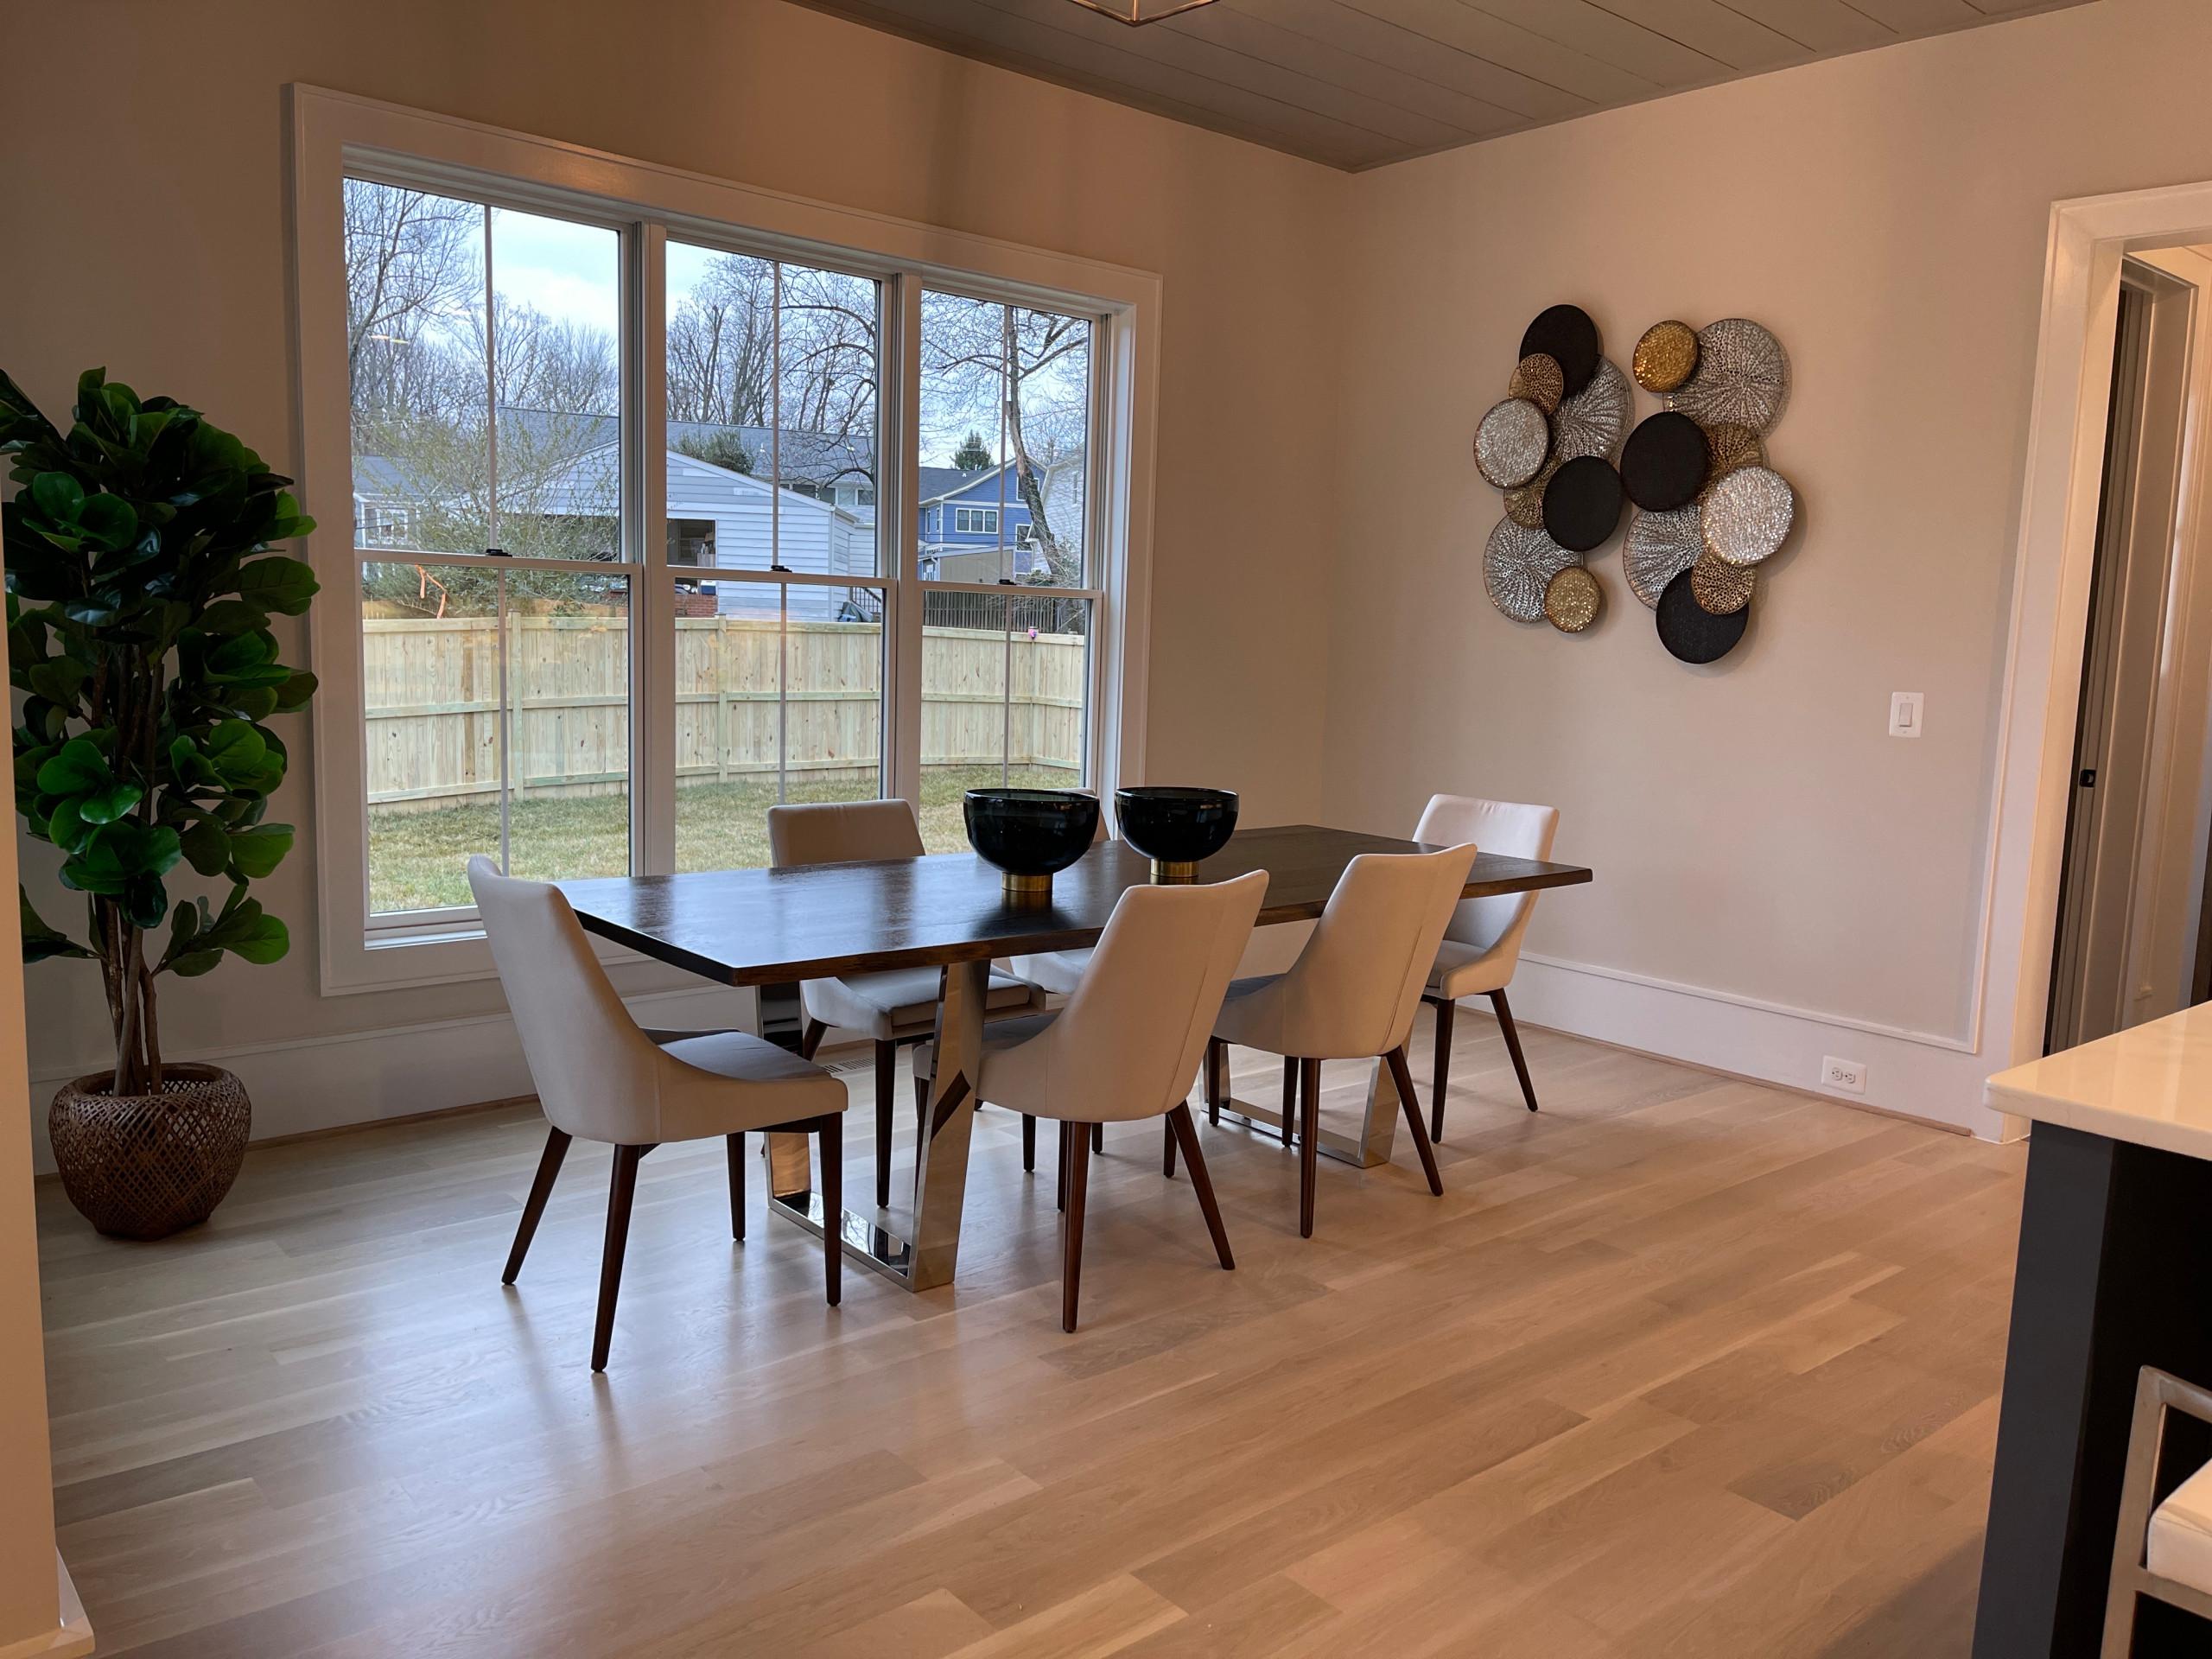 New Construction Dining Room